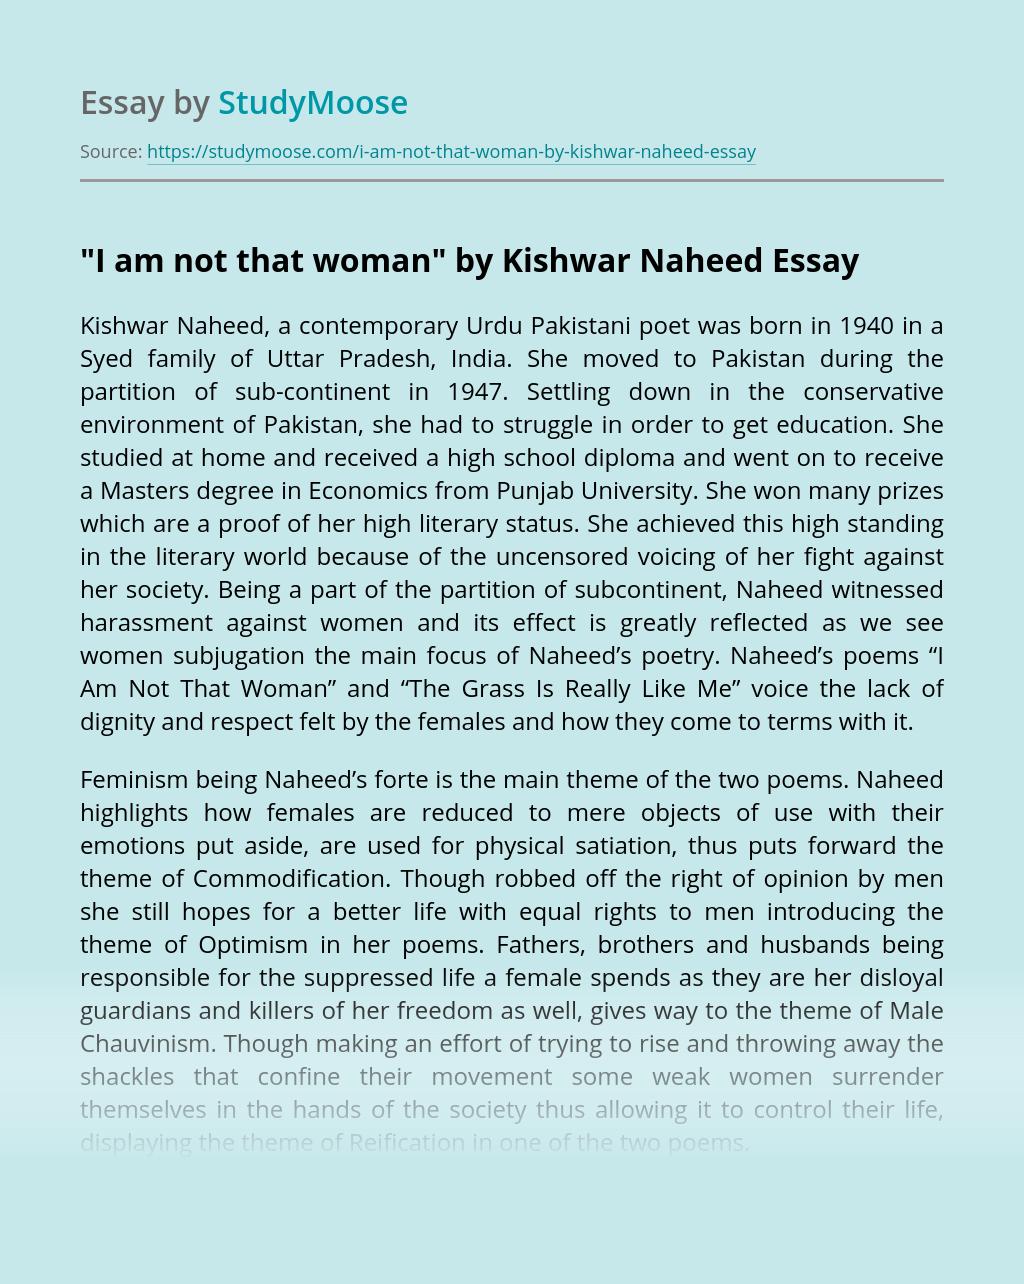 """I am Not that Woman"" by Kishwar Naheed"